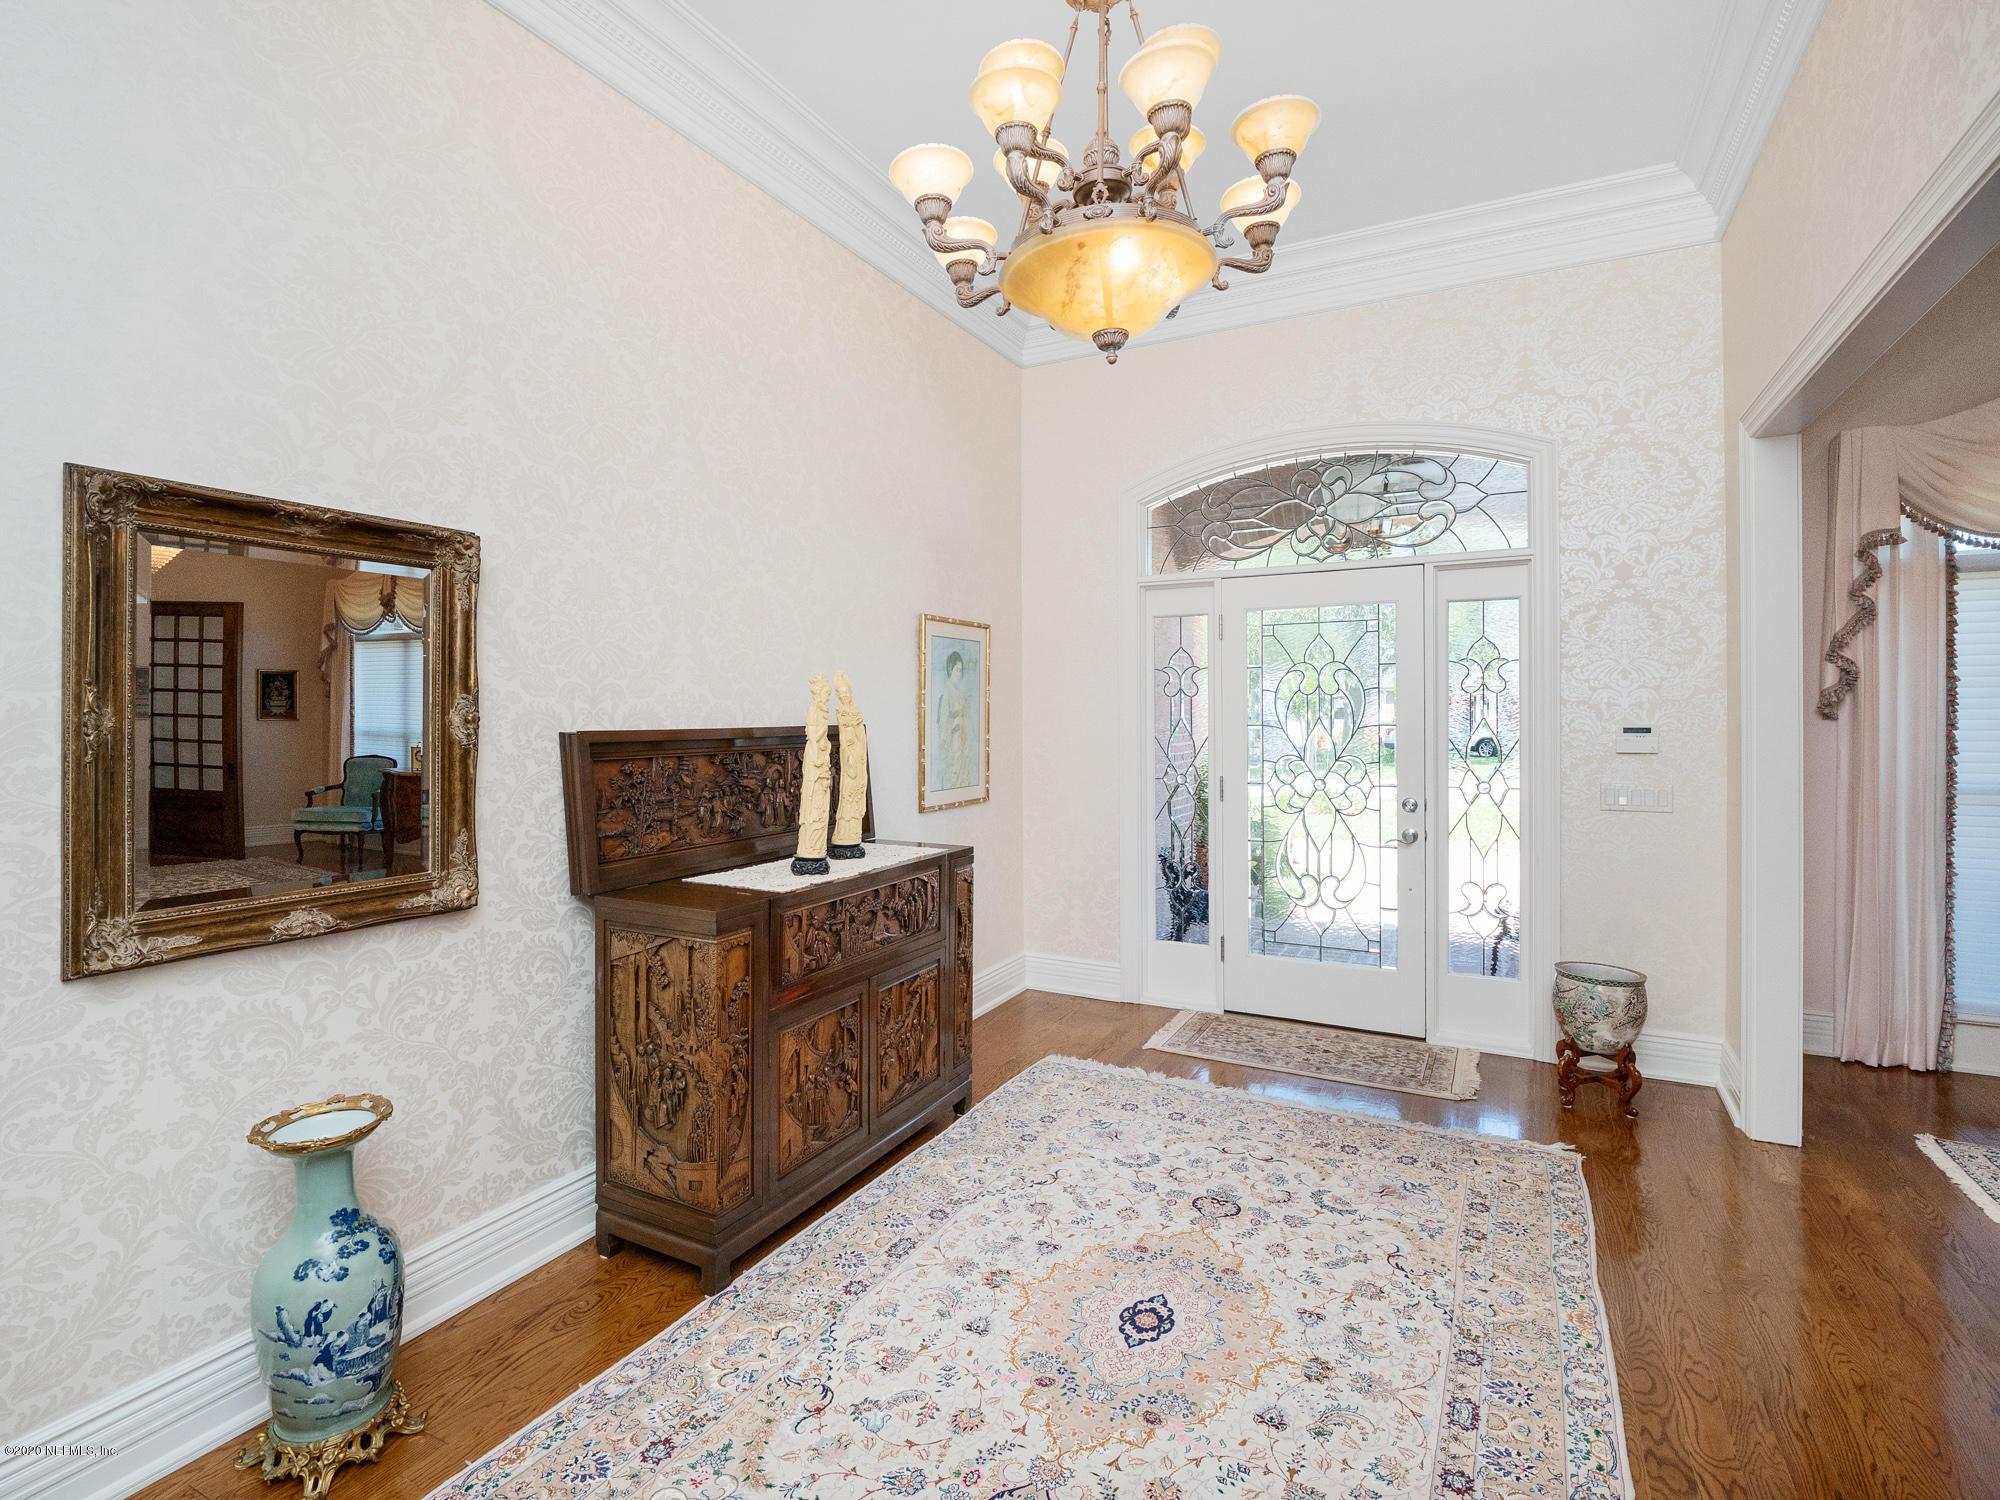 8064 HOLLYRIDGE, JACKSONVILLE, FLORIDA 32256, 3 Bedrooms Bedrooms, ,2 BathroomsBathrooms,Residential,For sale,HOLLYRIDGE,1051844